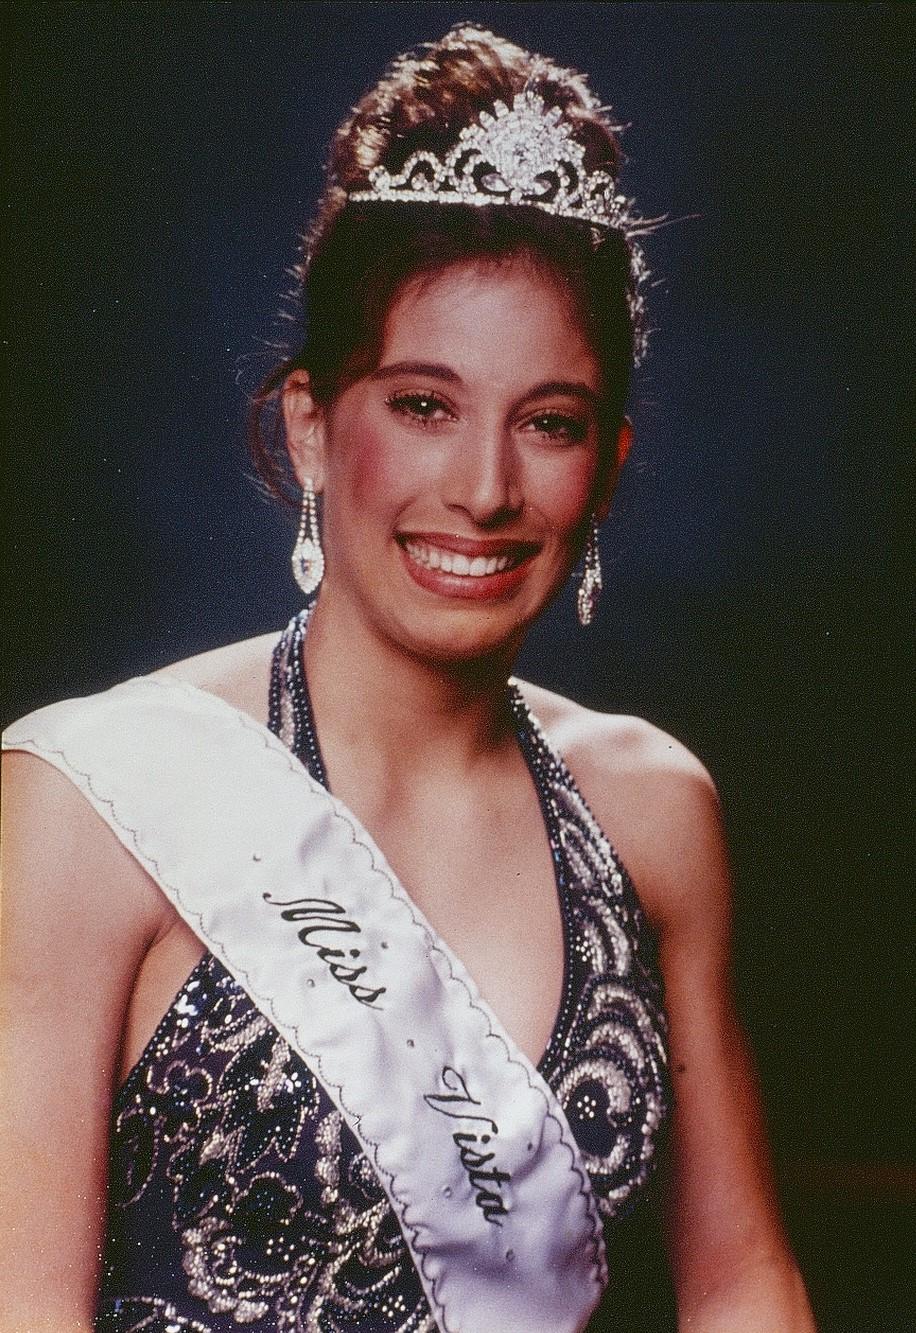 Kate Allison, Miss Vista 1997